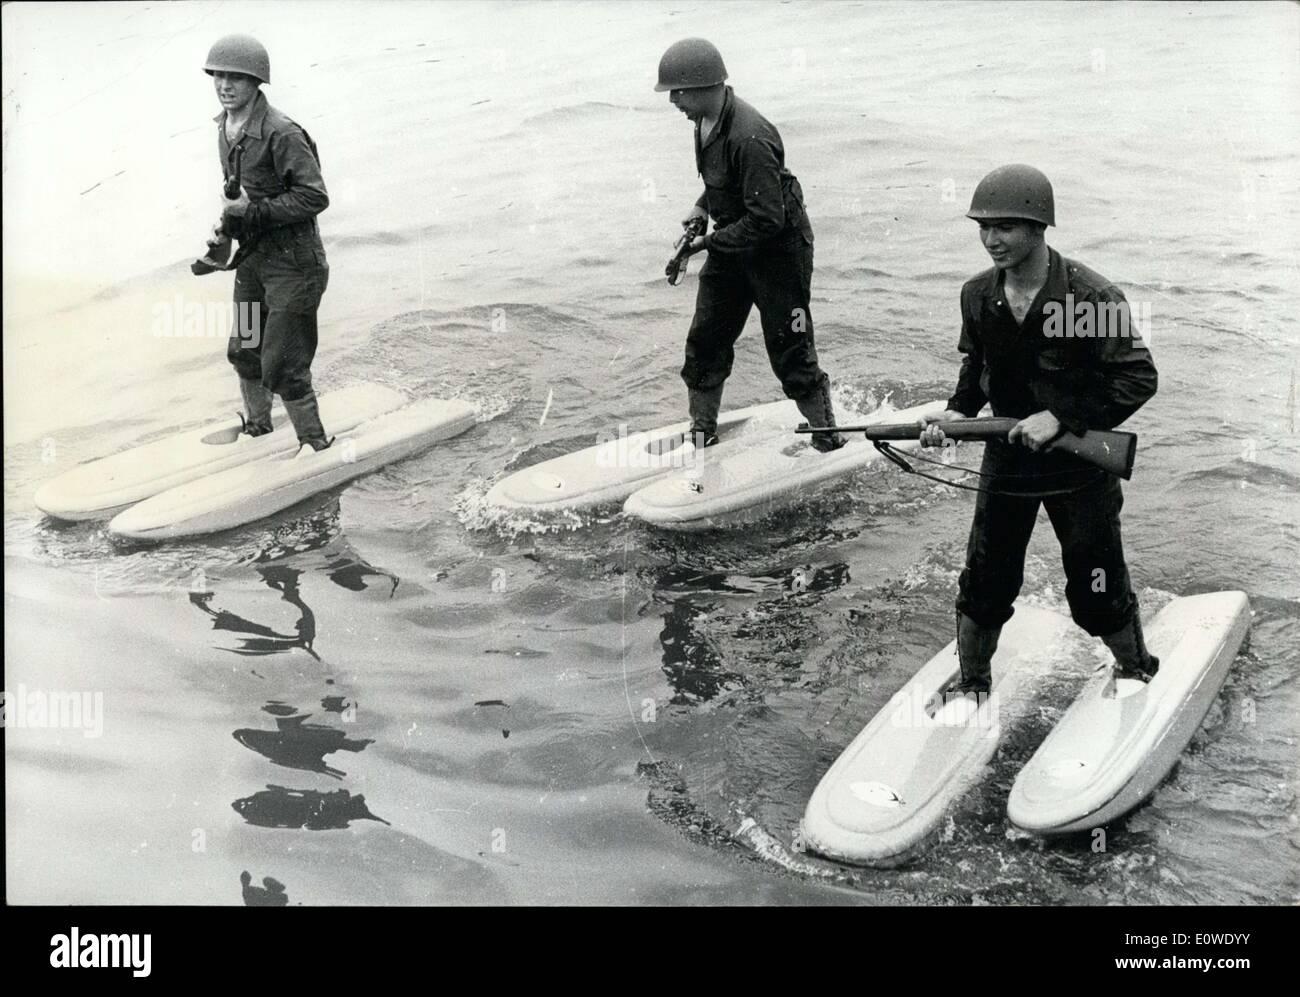 Jun. 29, 1962 - American Soldiers Walking on Water at the Pentagon's Lake - Stock Image